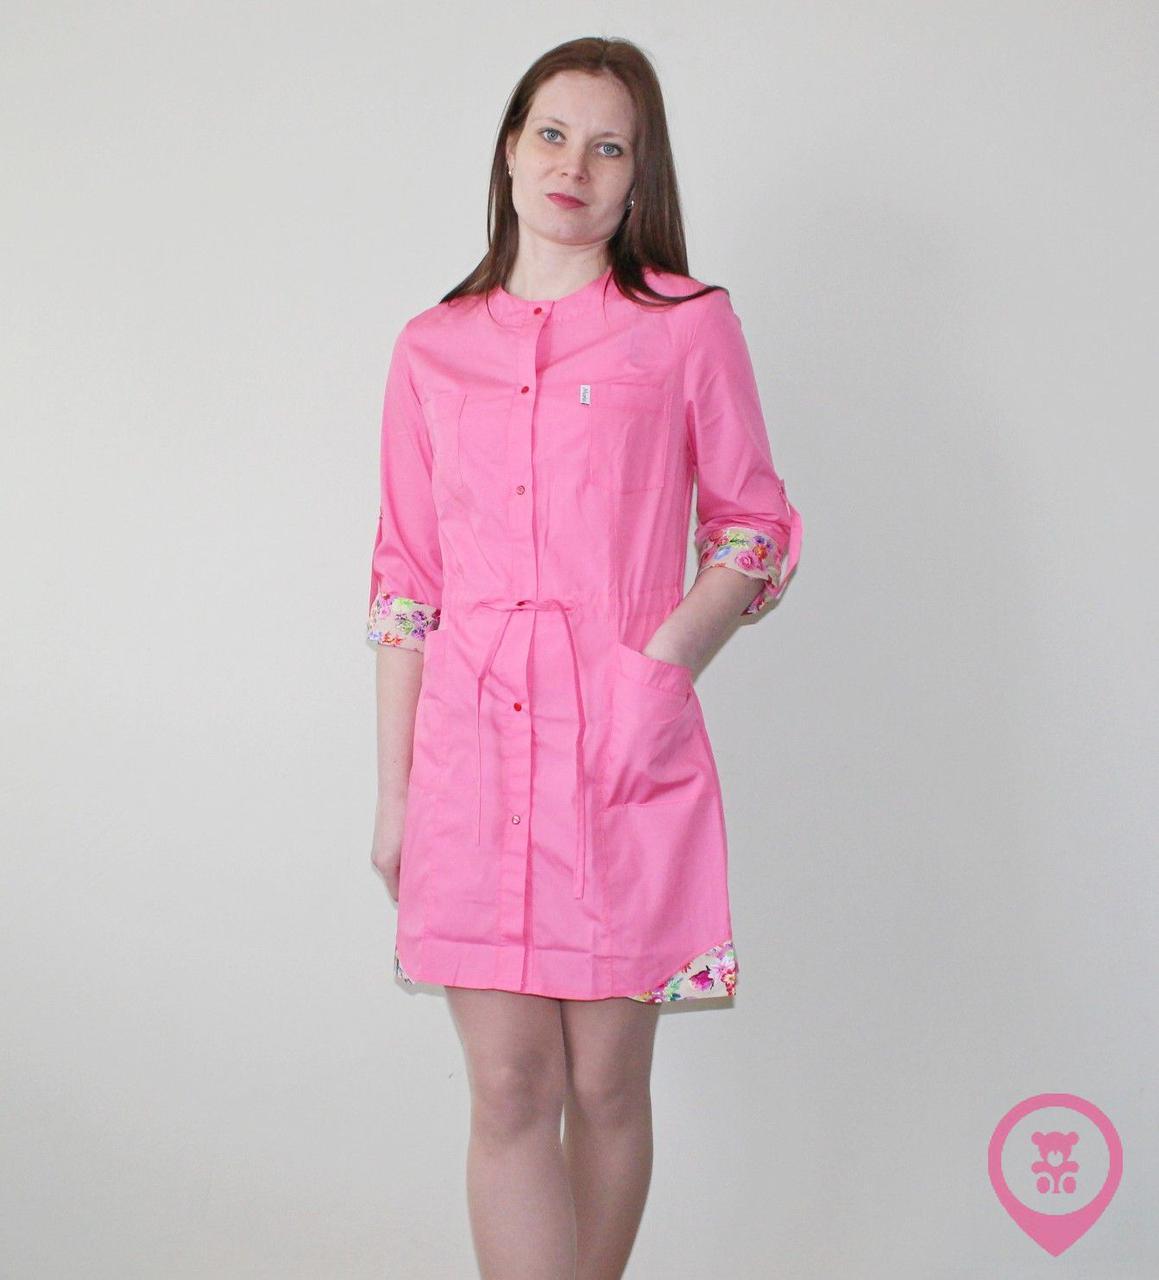 Медицинский женский халат SM 9140-6 Angela ХБ